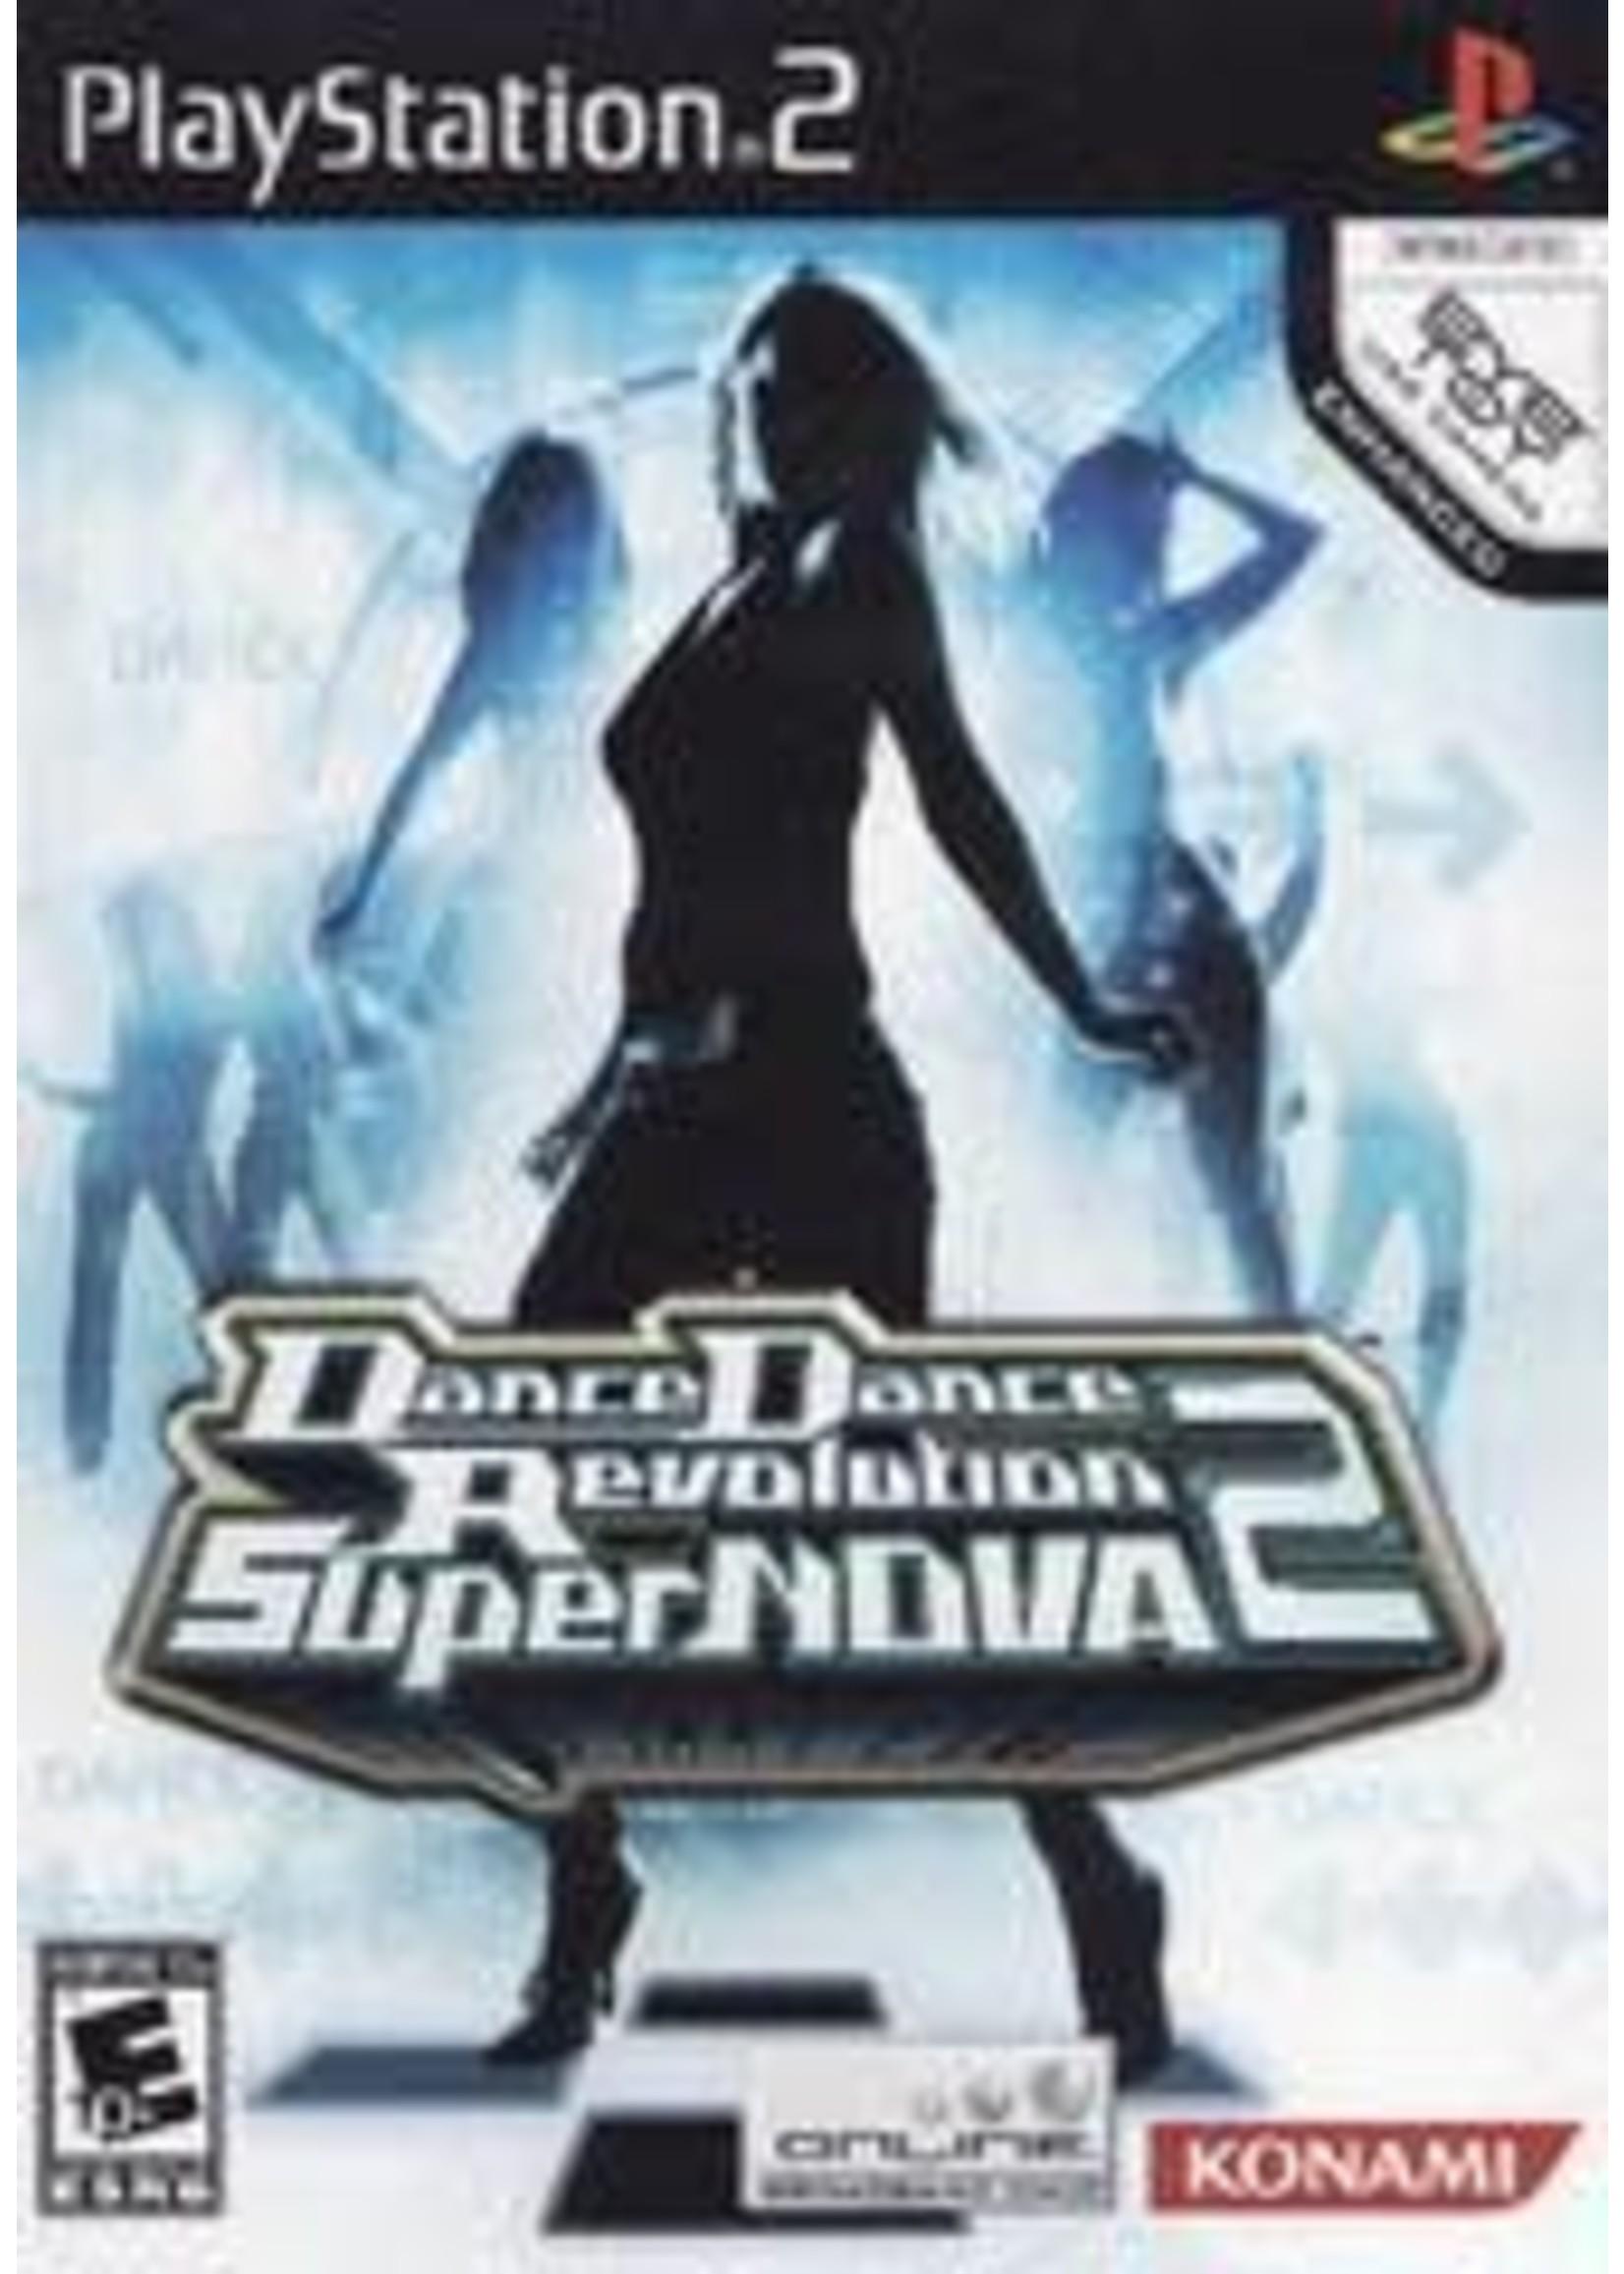 Dance Dance Revolution SuperNova 2 Playstation 2